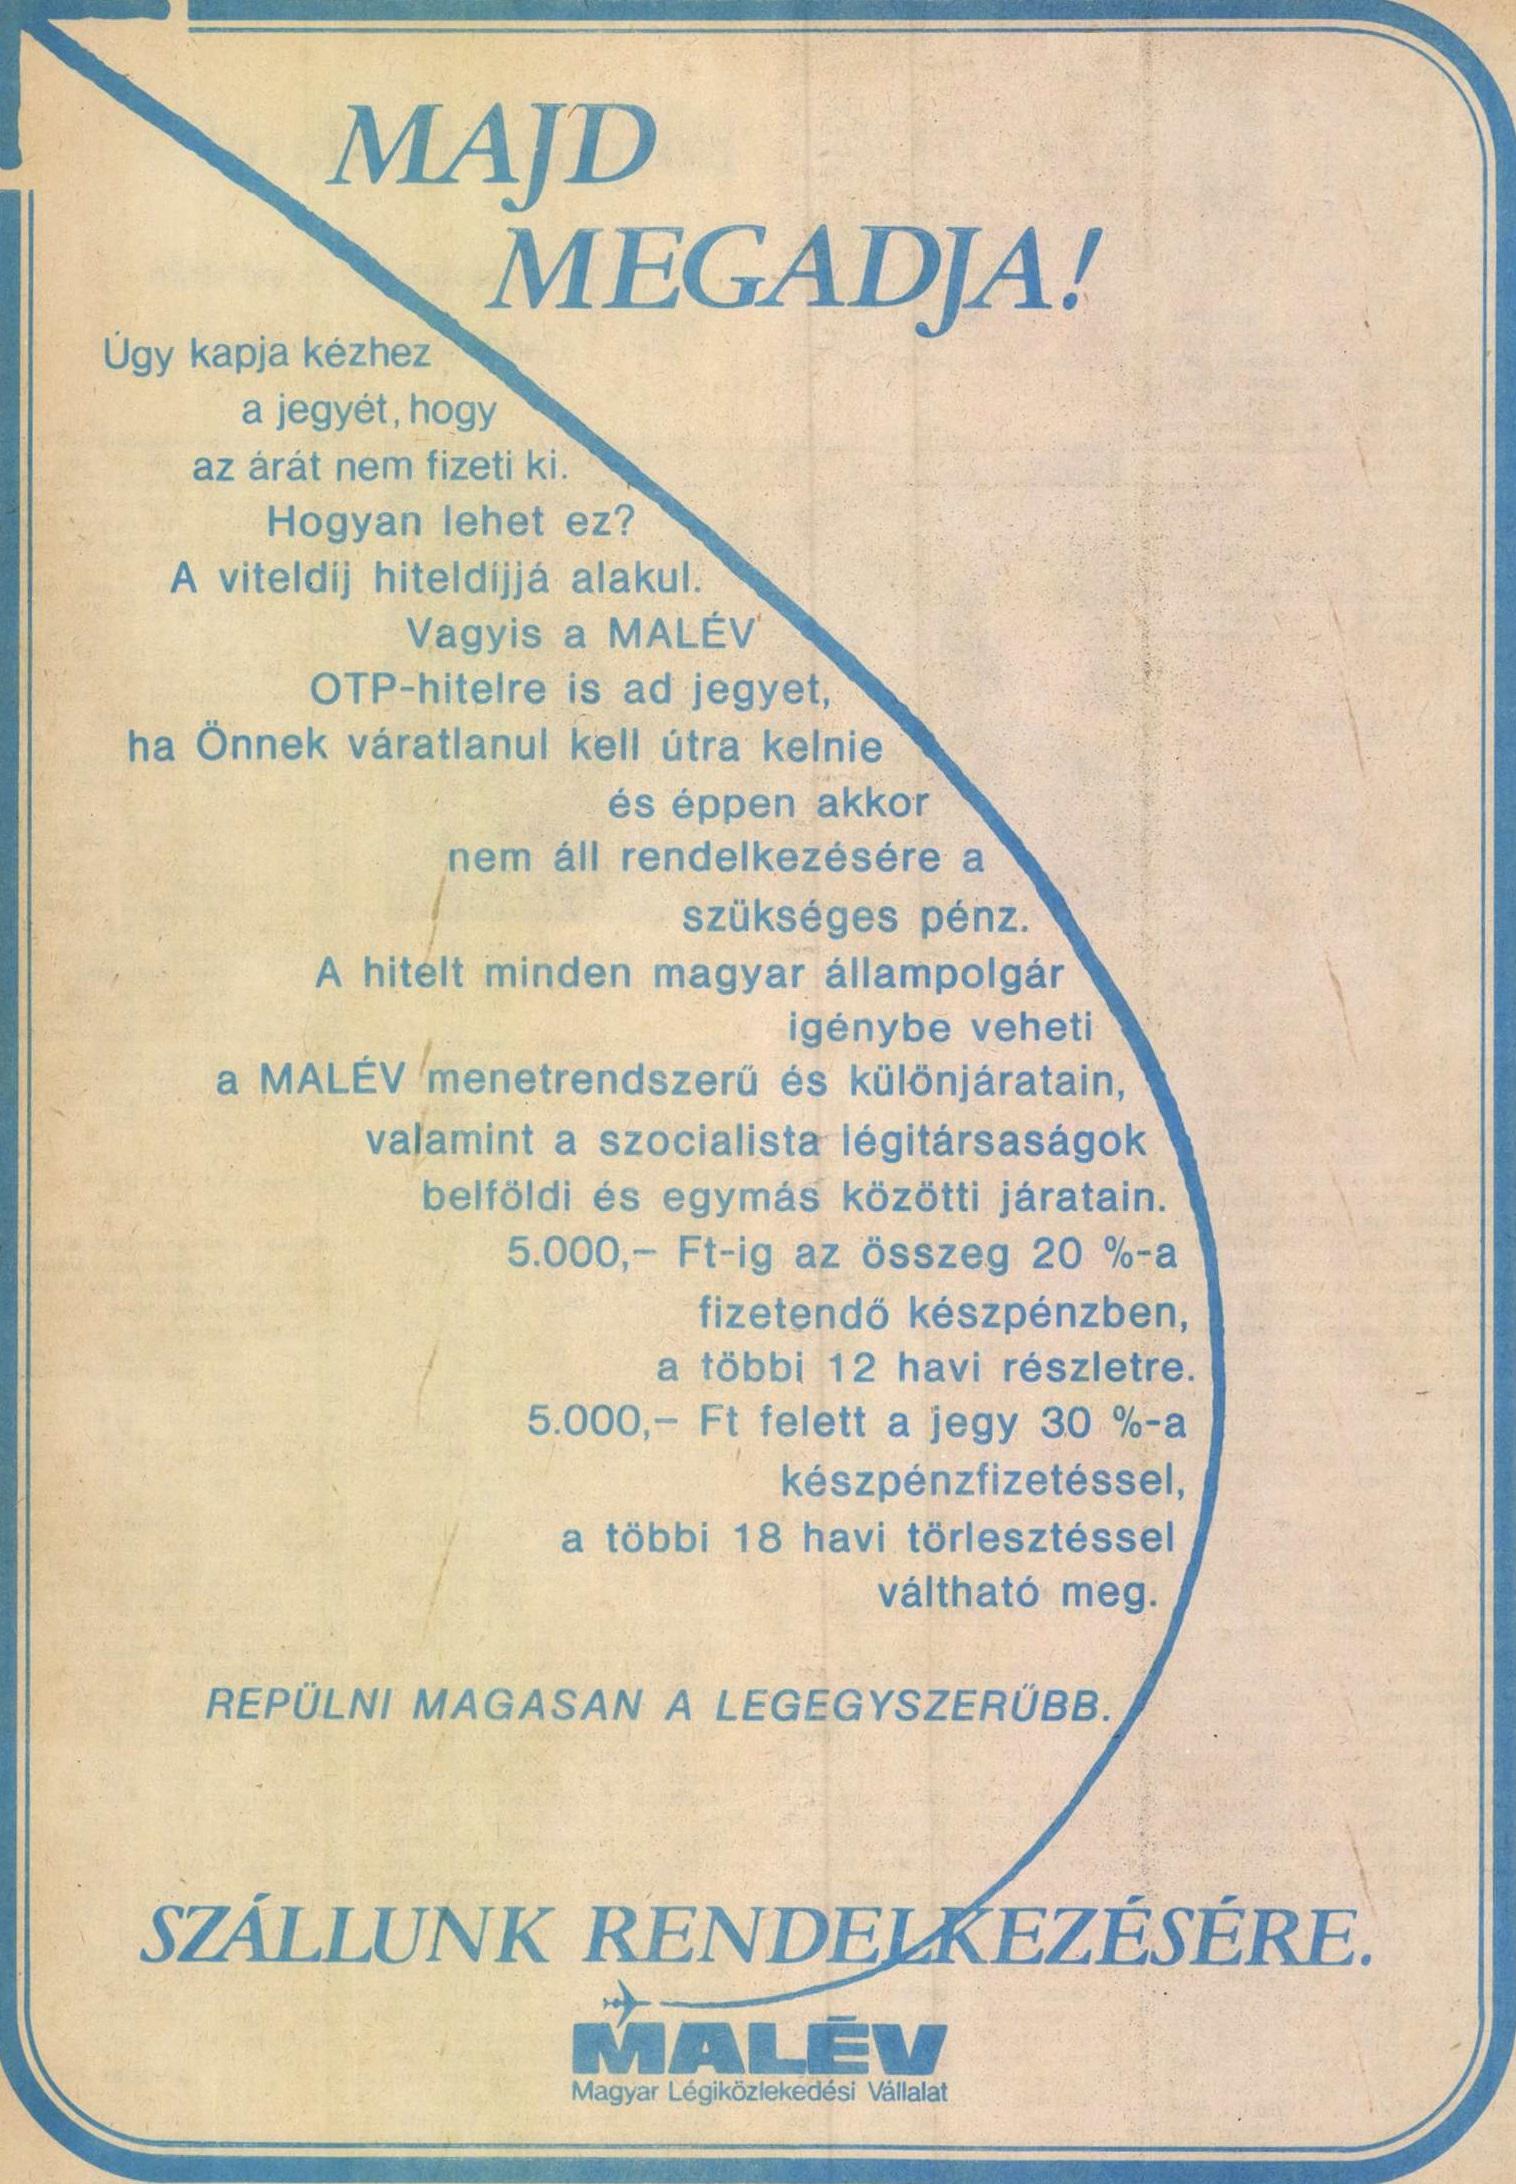 idokapszula_nb_i_1983_84_27_fordulo_reklam_1.jpg